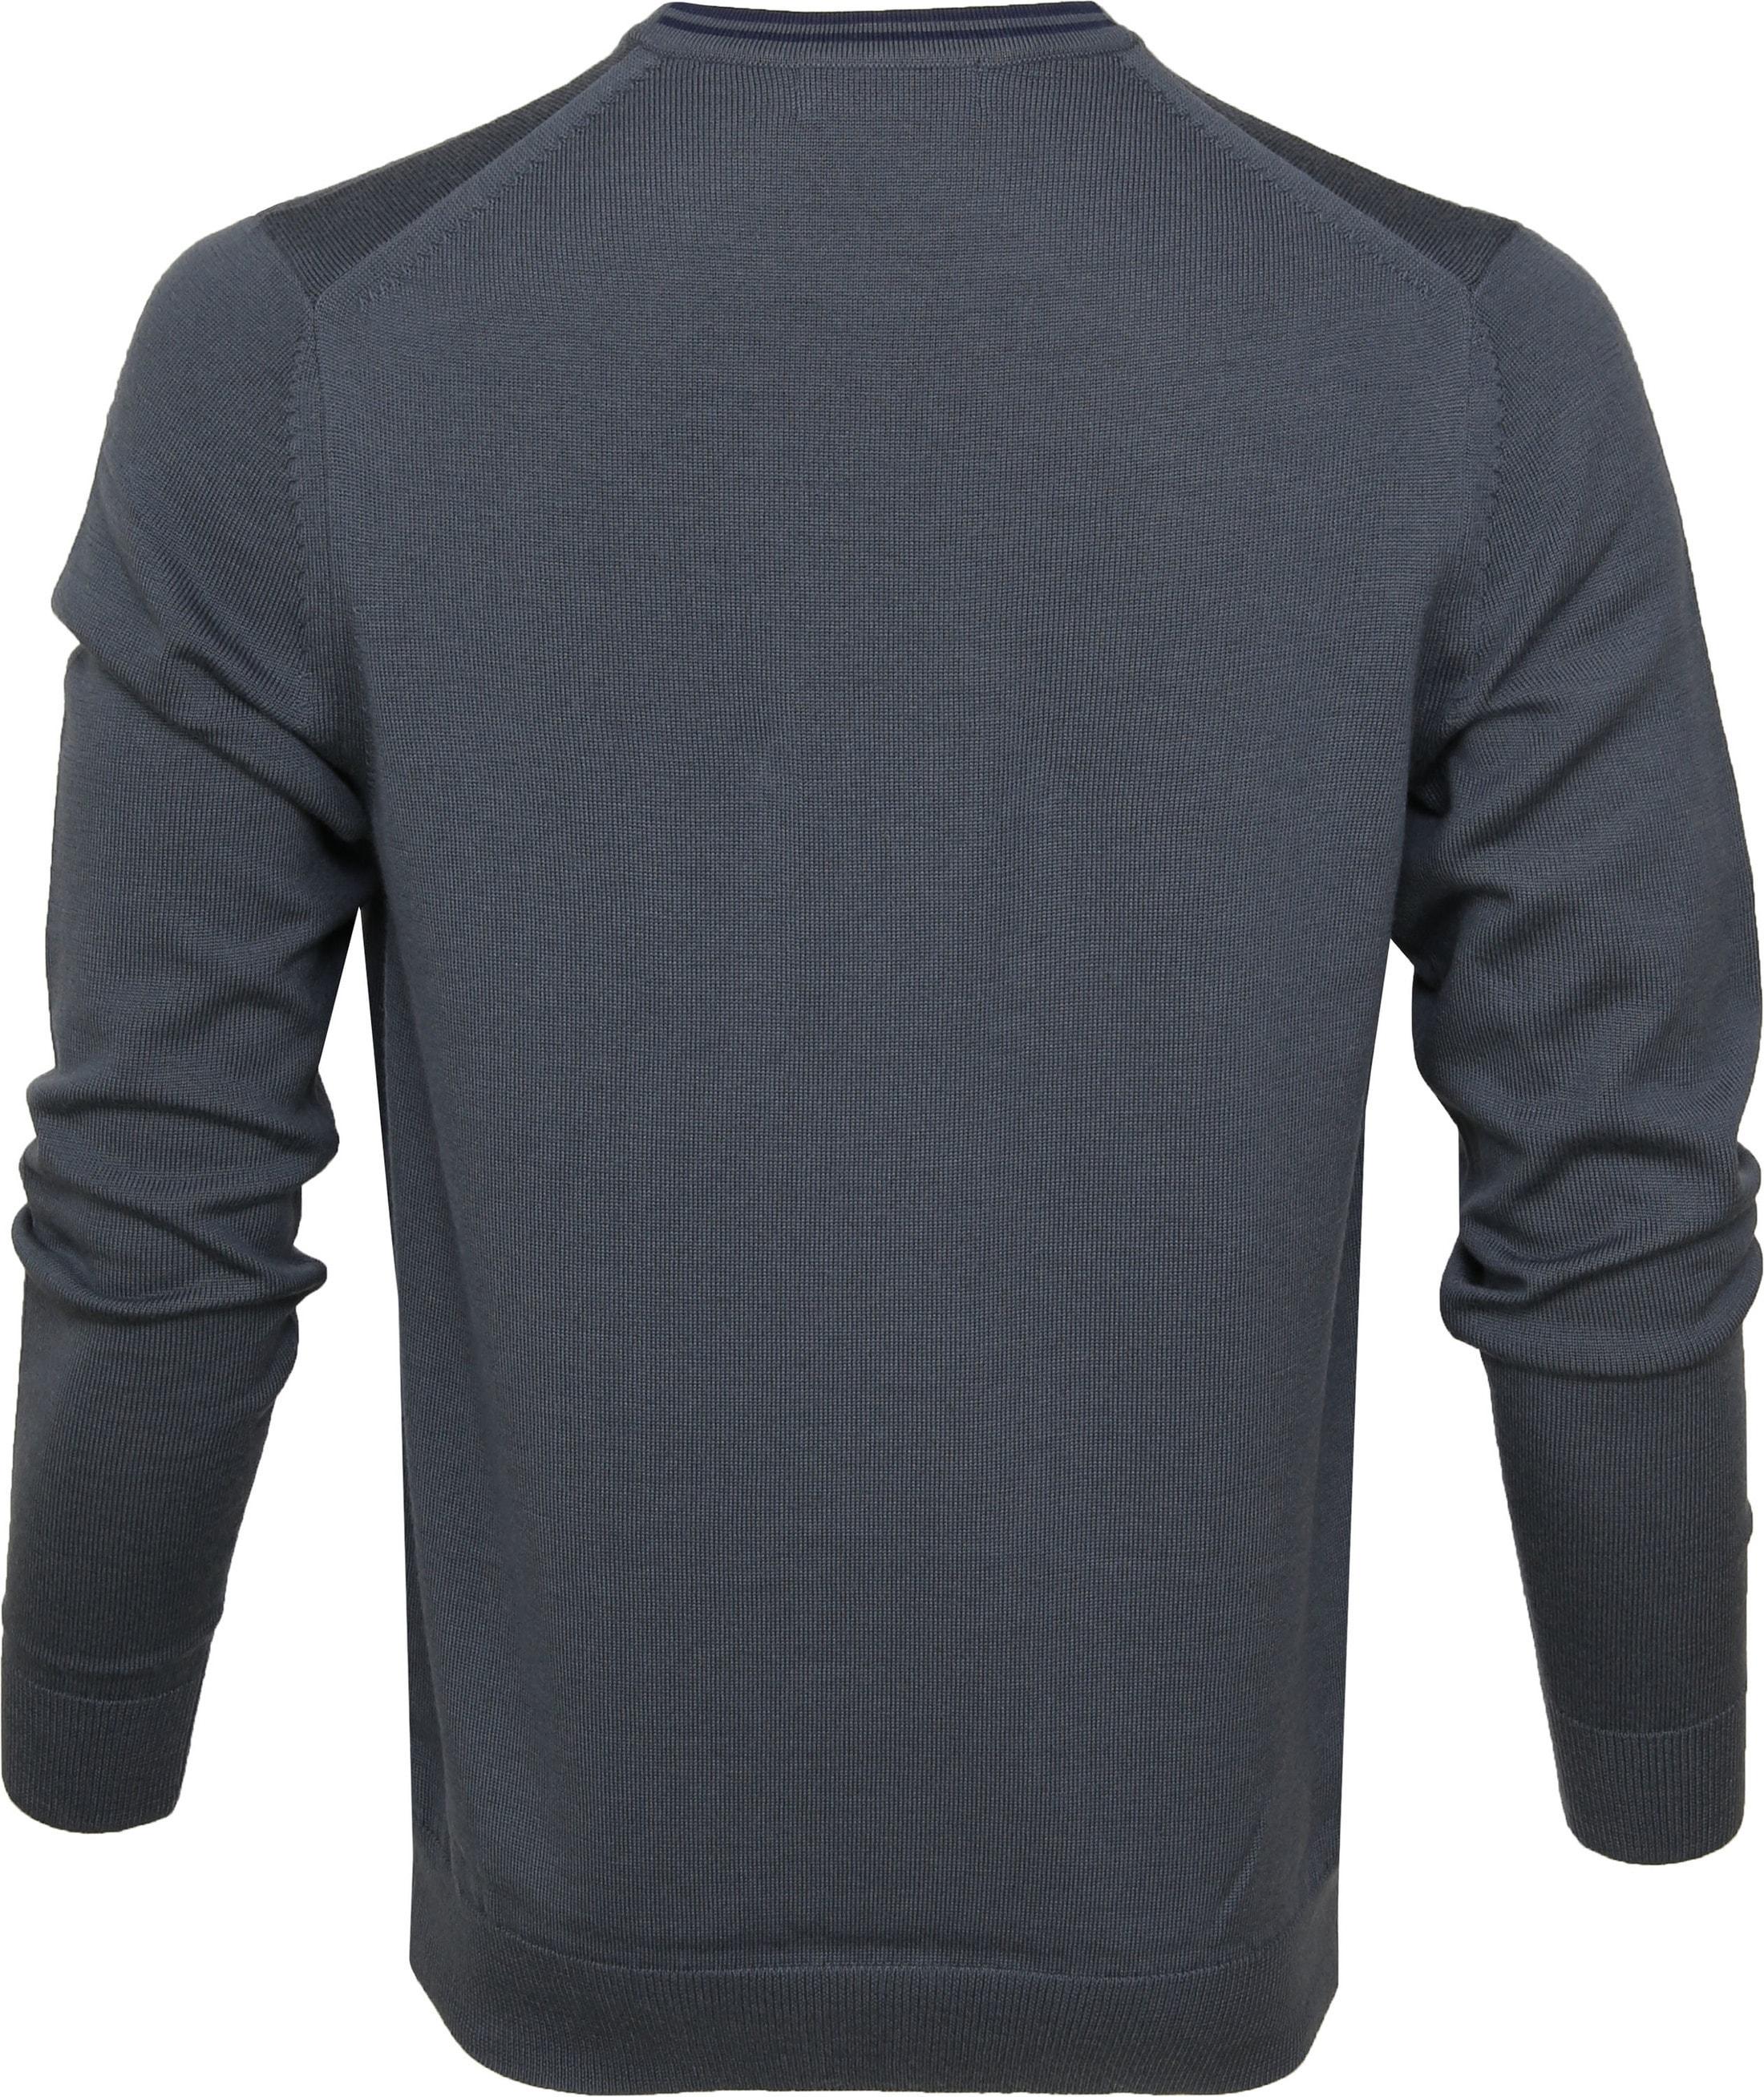 Fred Perry Sweater Classic Merino Grey foto 3